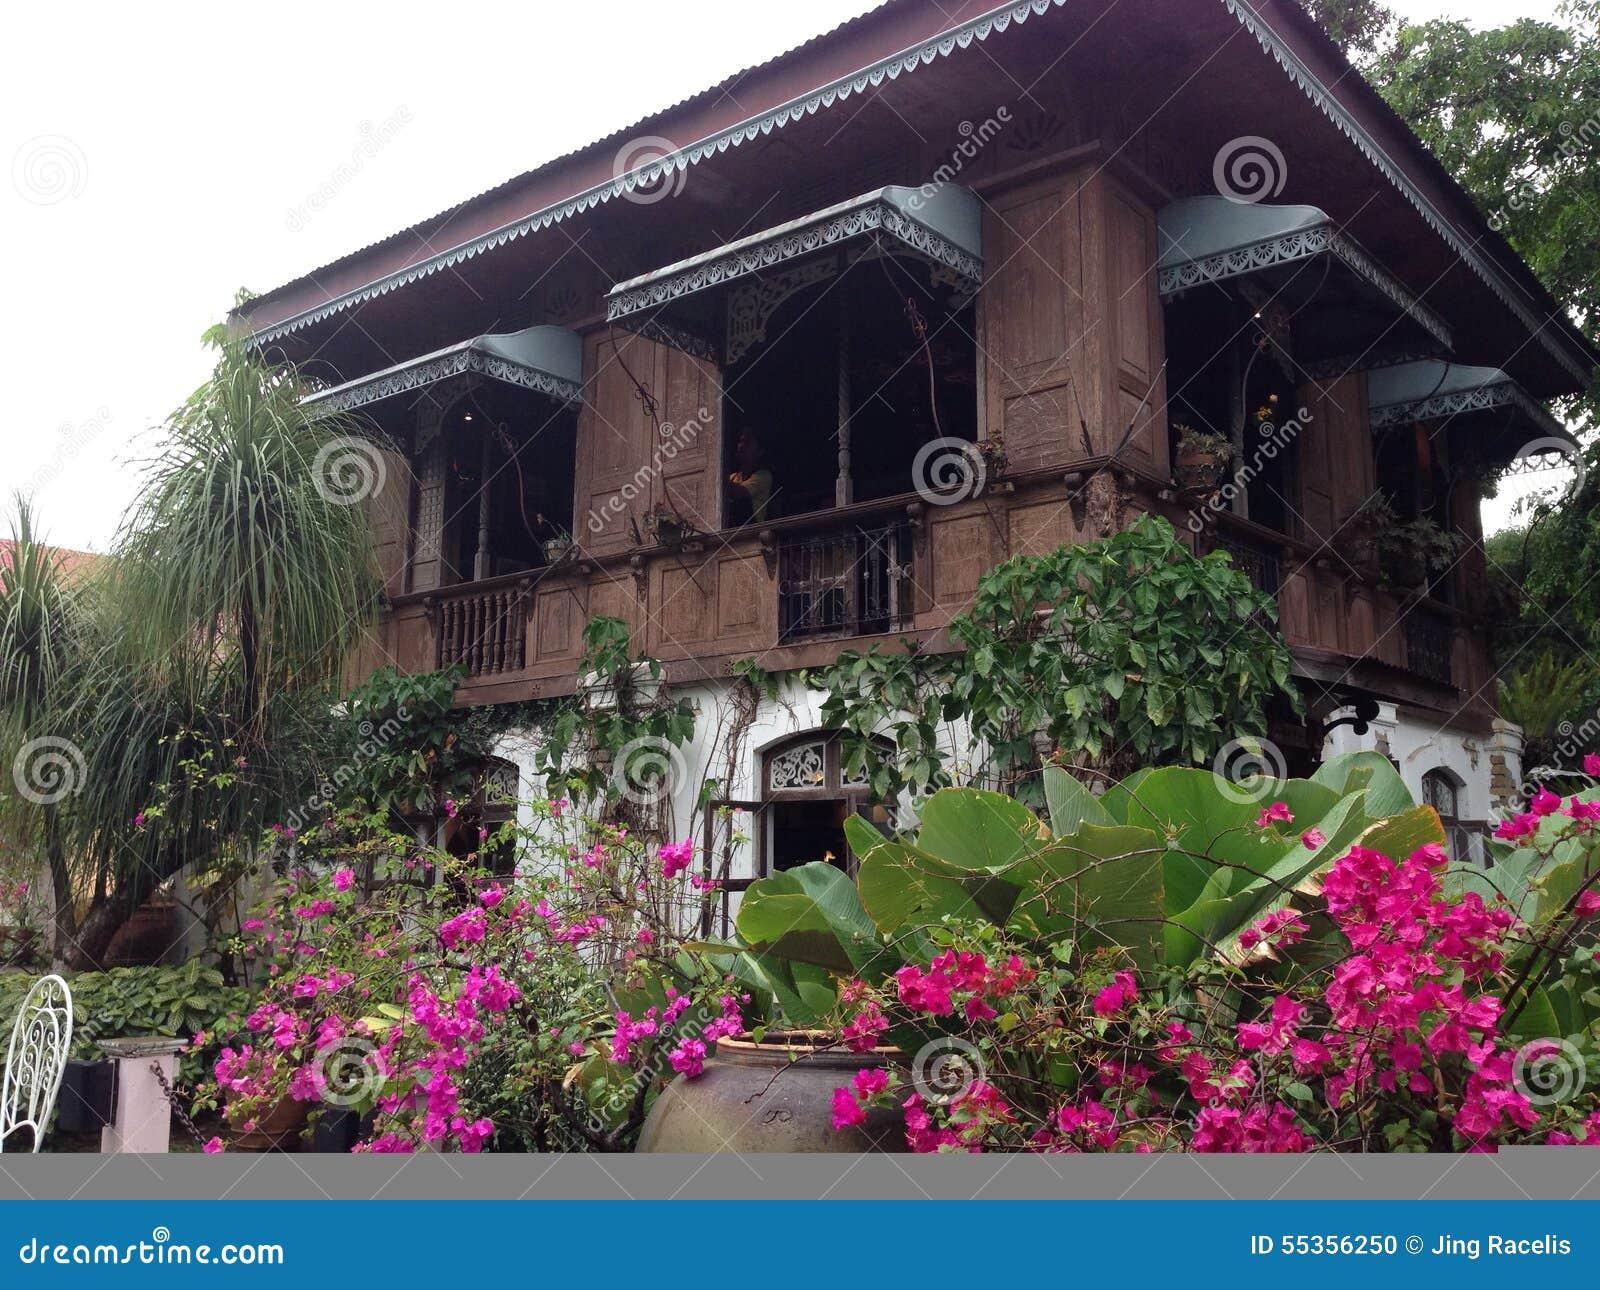 Case ancestrali con le storie